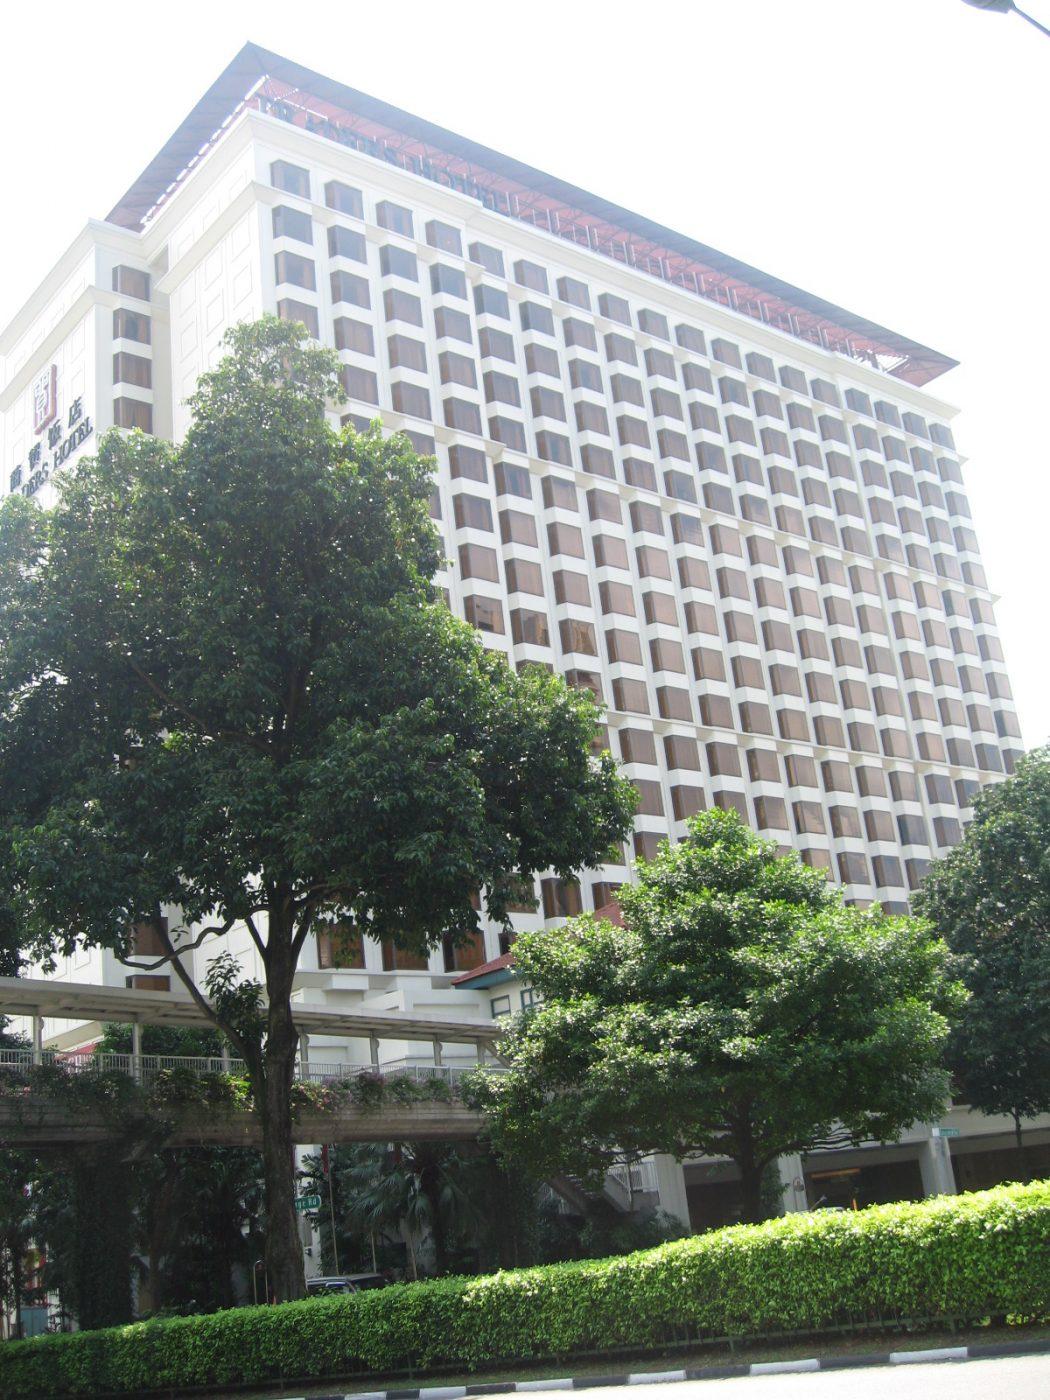 Traders_Hotel_Singapore 8 Reasons Make You Enjoy Traders Hotel Singapore?